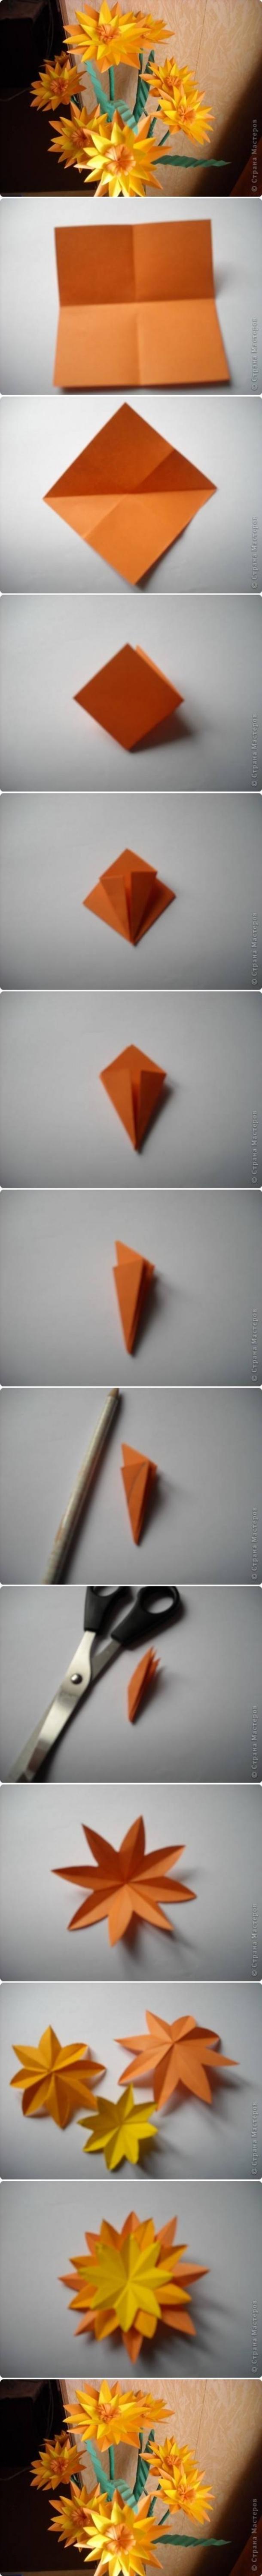 Diy Paper Marigold Flower